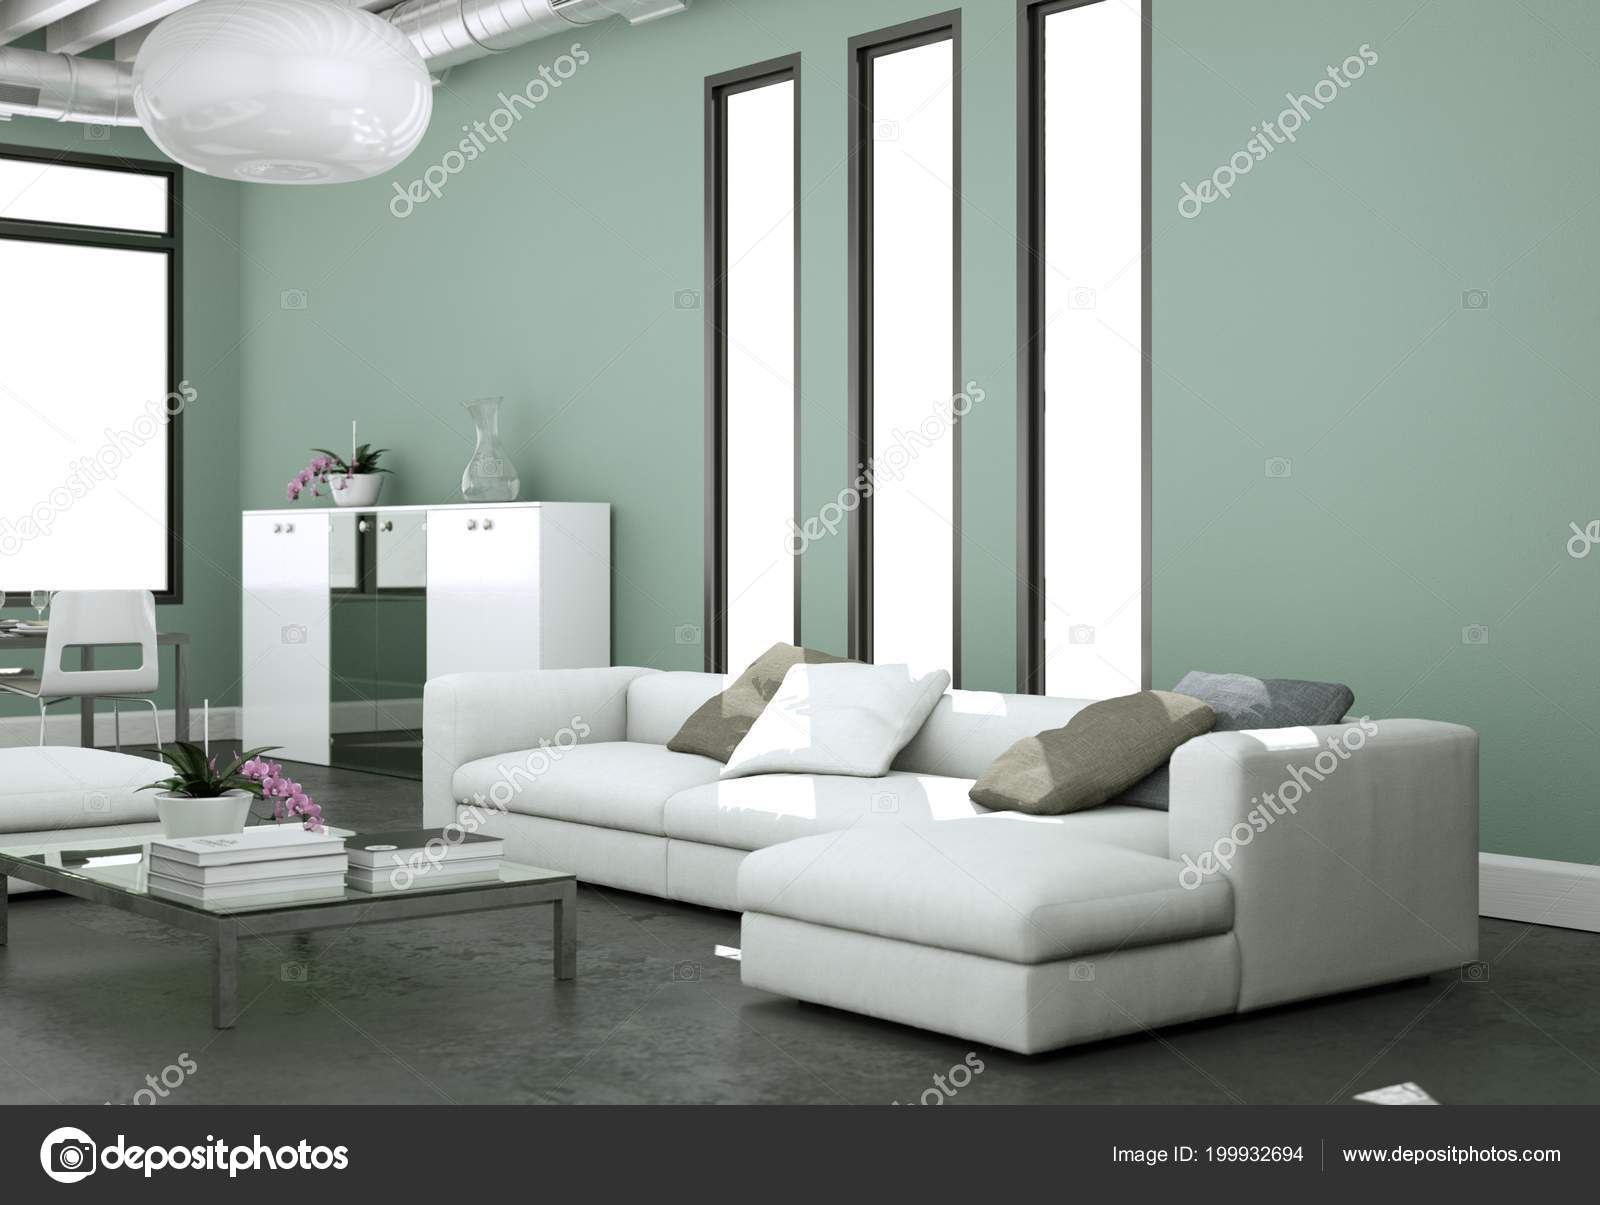 Dise o de interiores moderno luminoso living comedor con sof s y paredes grises foto de stock - Diseno de interiores paredes ...